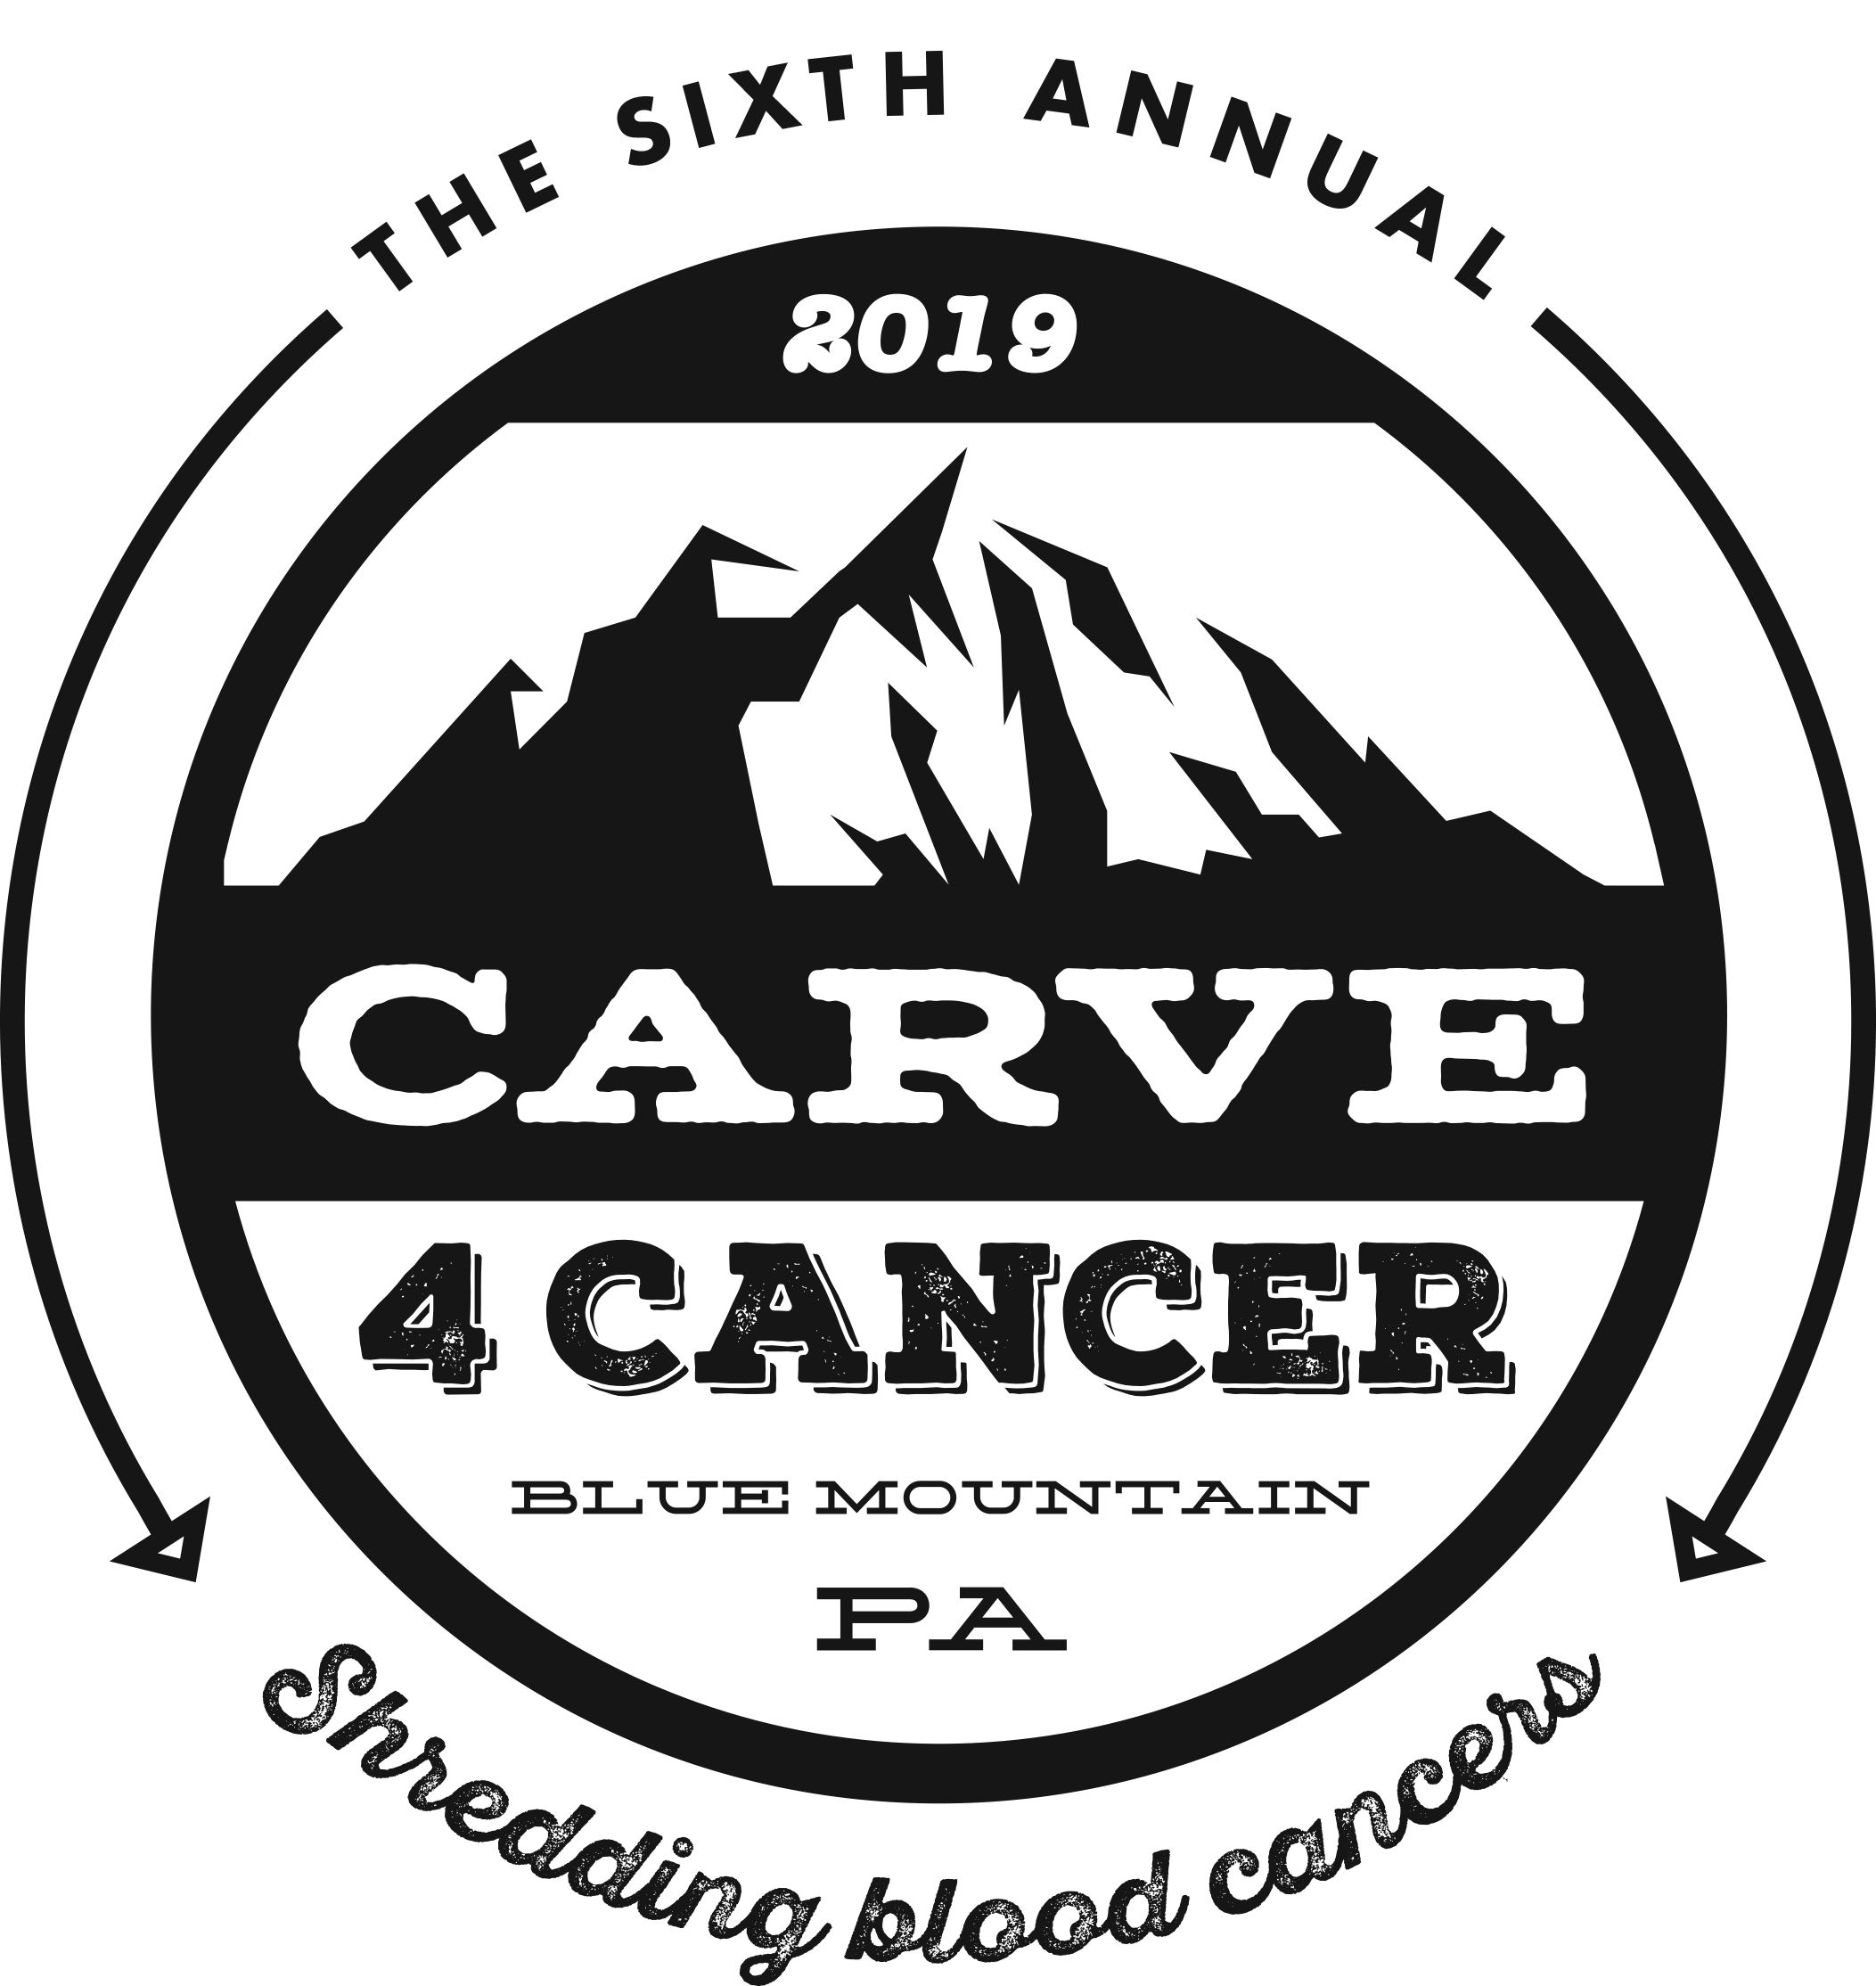 C4C_2019_Event_Logo_Black.png